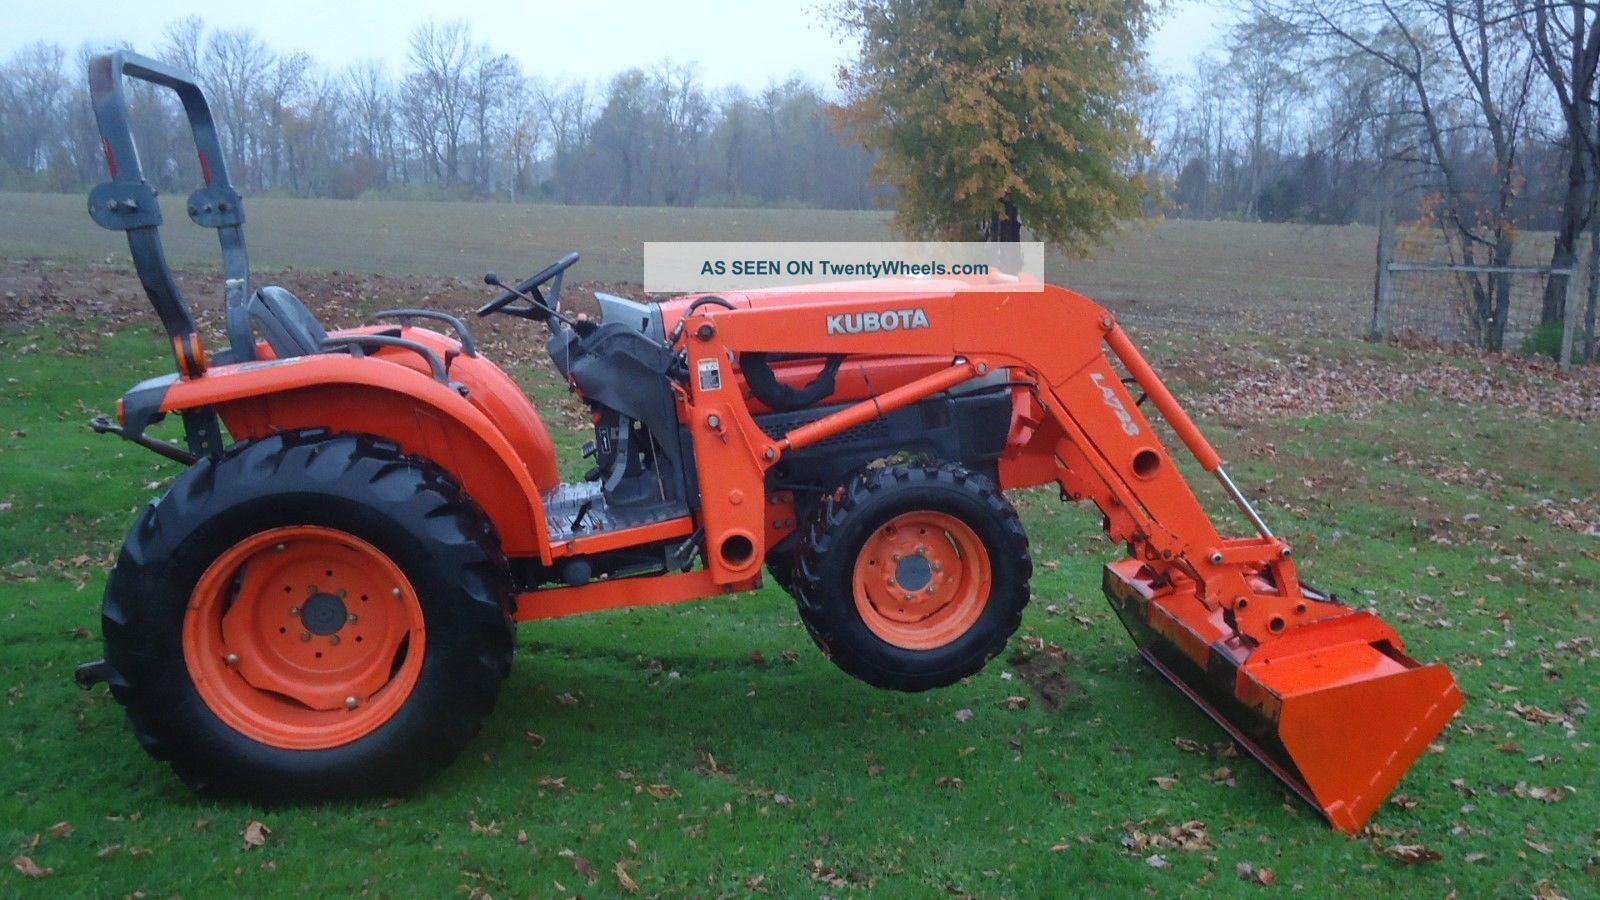 Kubota l2850 farm tractor kubota farm tractors kubota farm kubota l3130 tractor tractors photo 2 fandeluxe Image collections